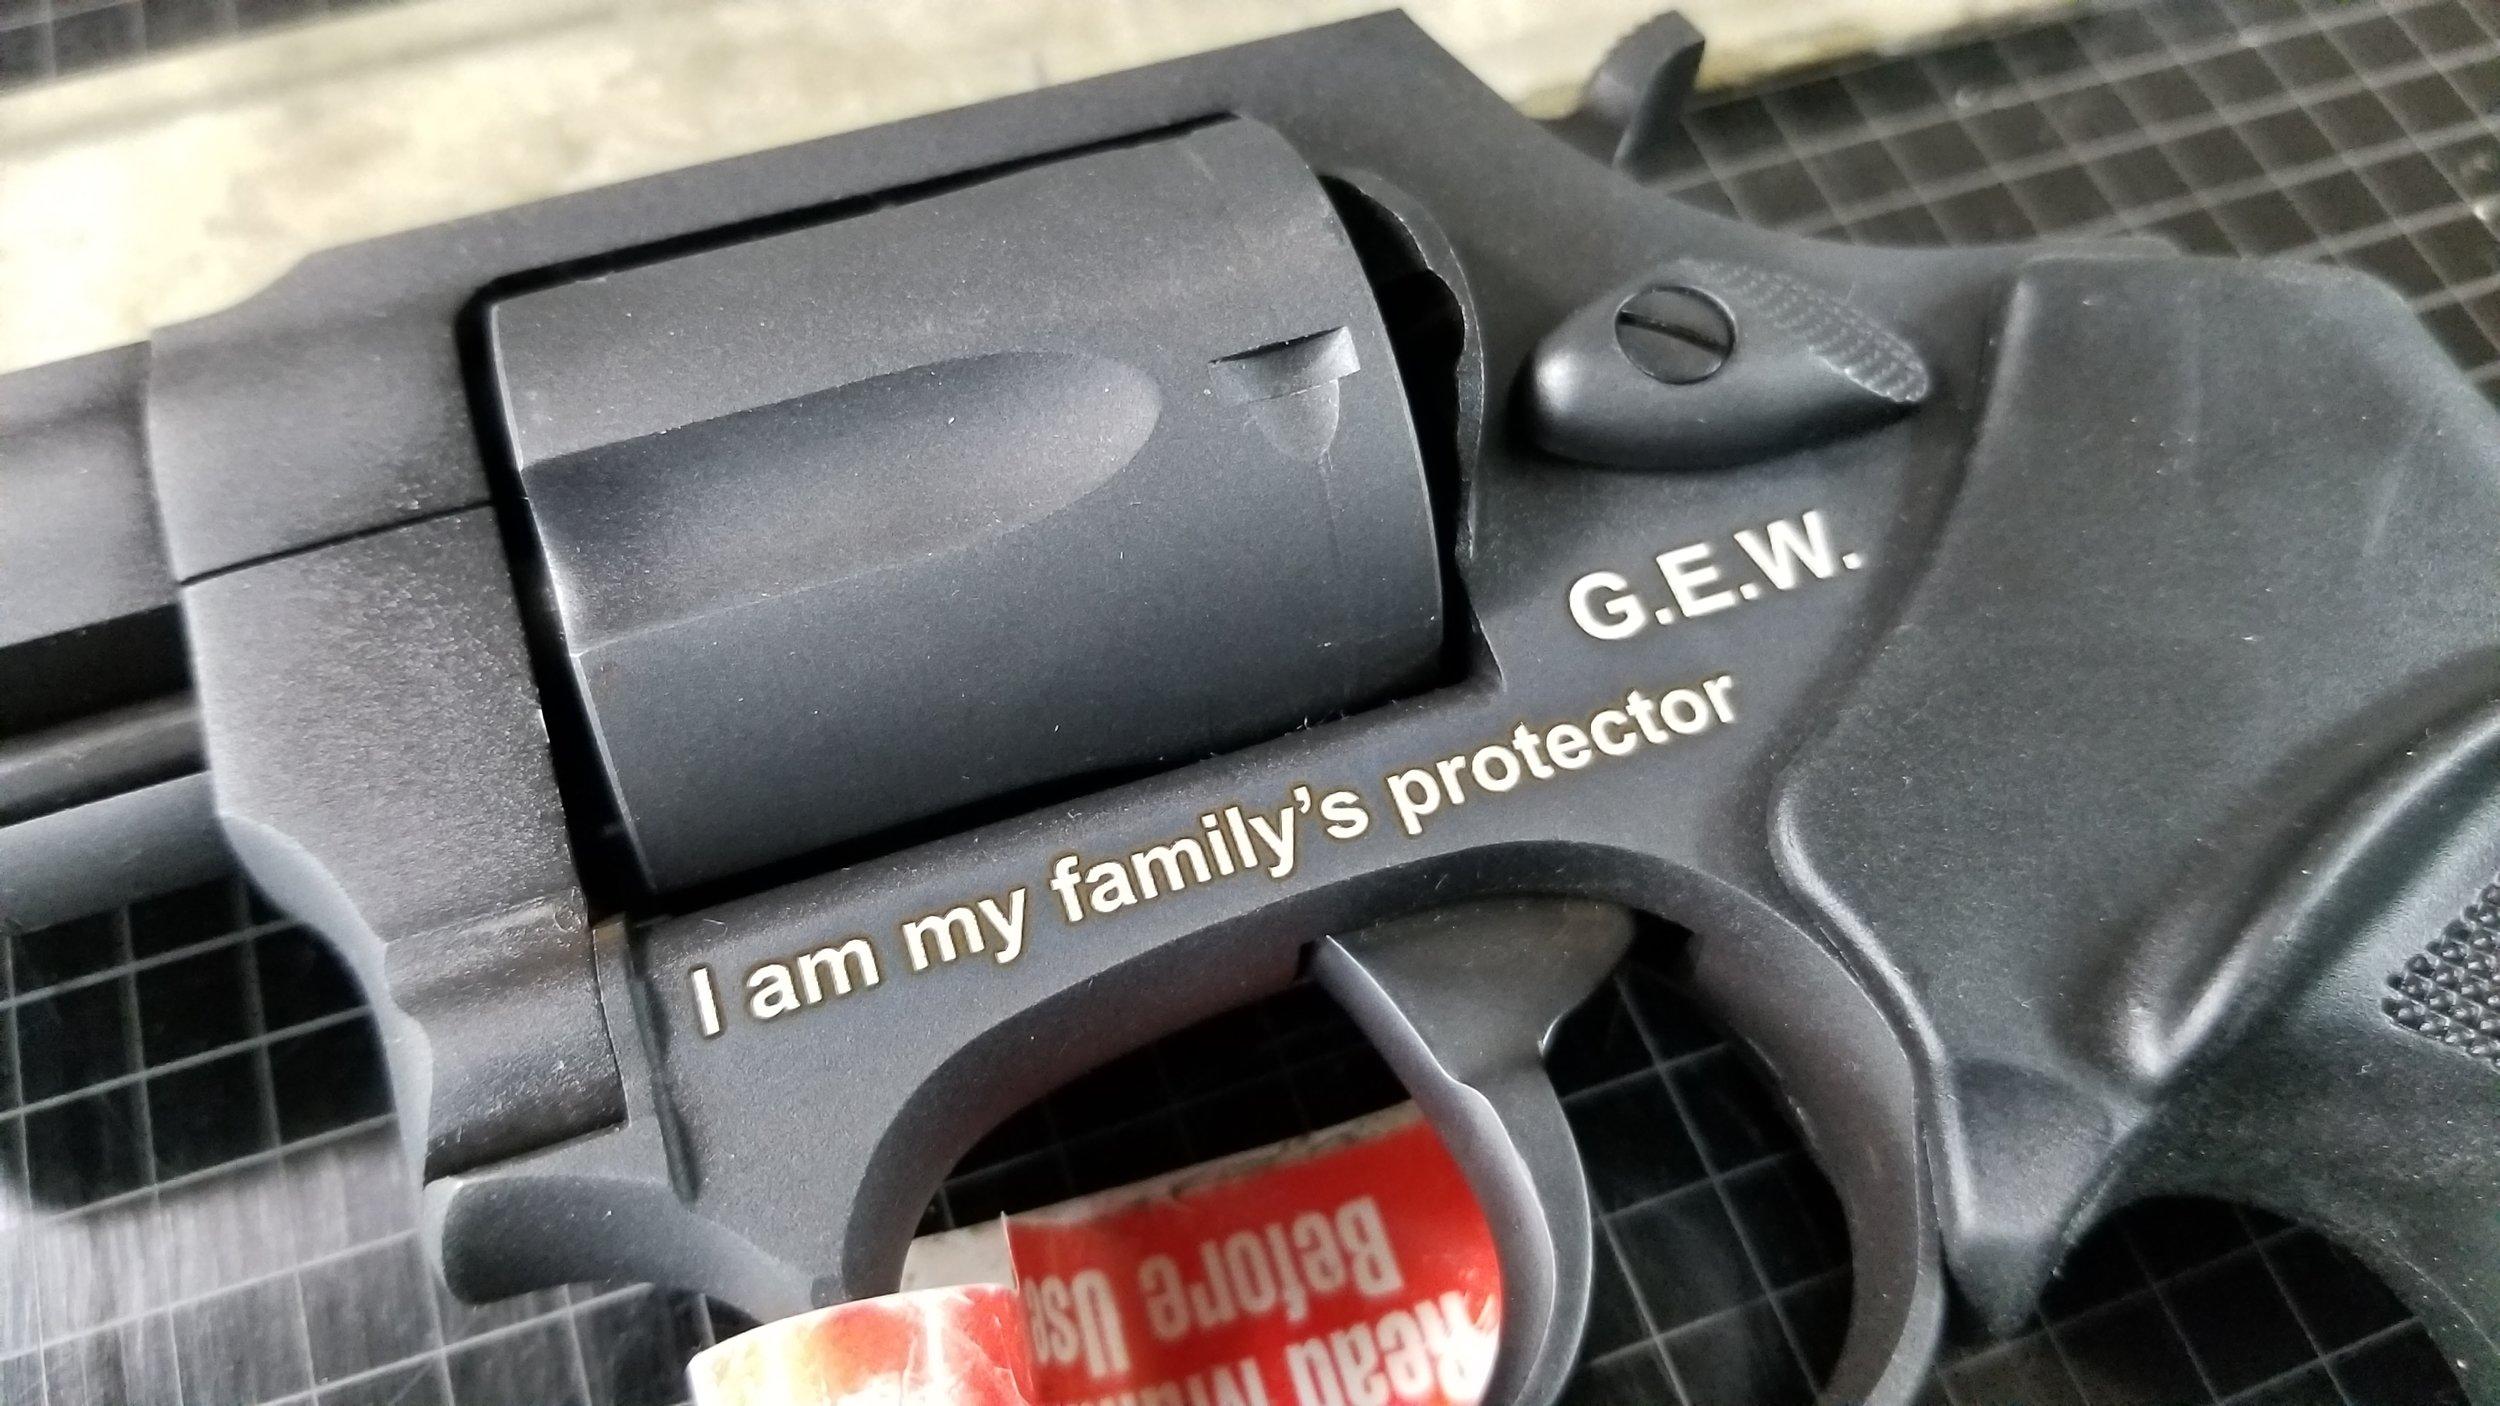 Engraved Revolver - Personalized Revolver - Customized Revolver - Firearm Engraving Projects - Engrave It Houston